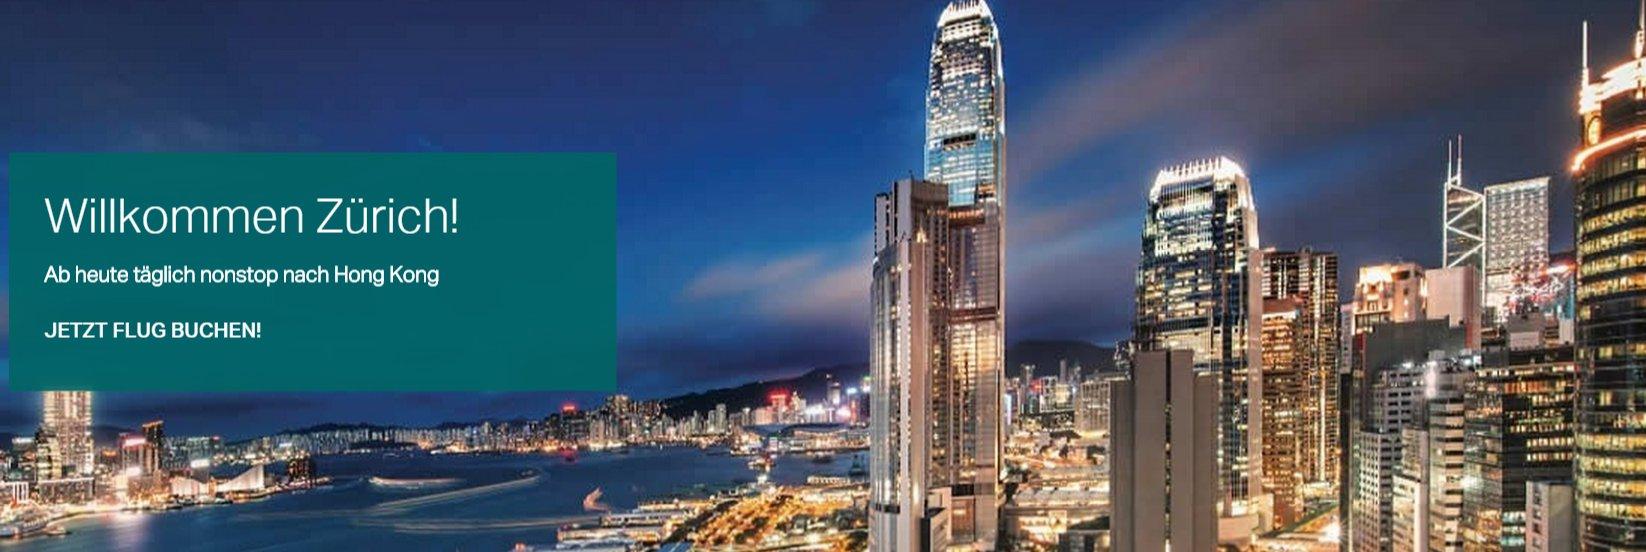 Cathay Pacific fliegt ab sofort täglich nach Hong Kong!